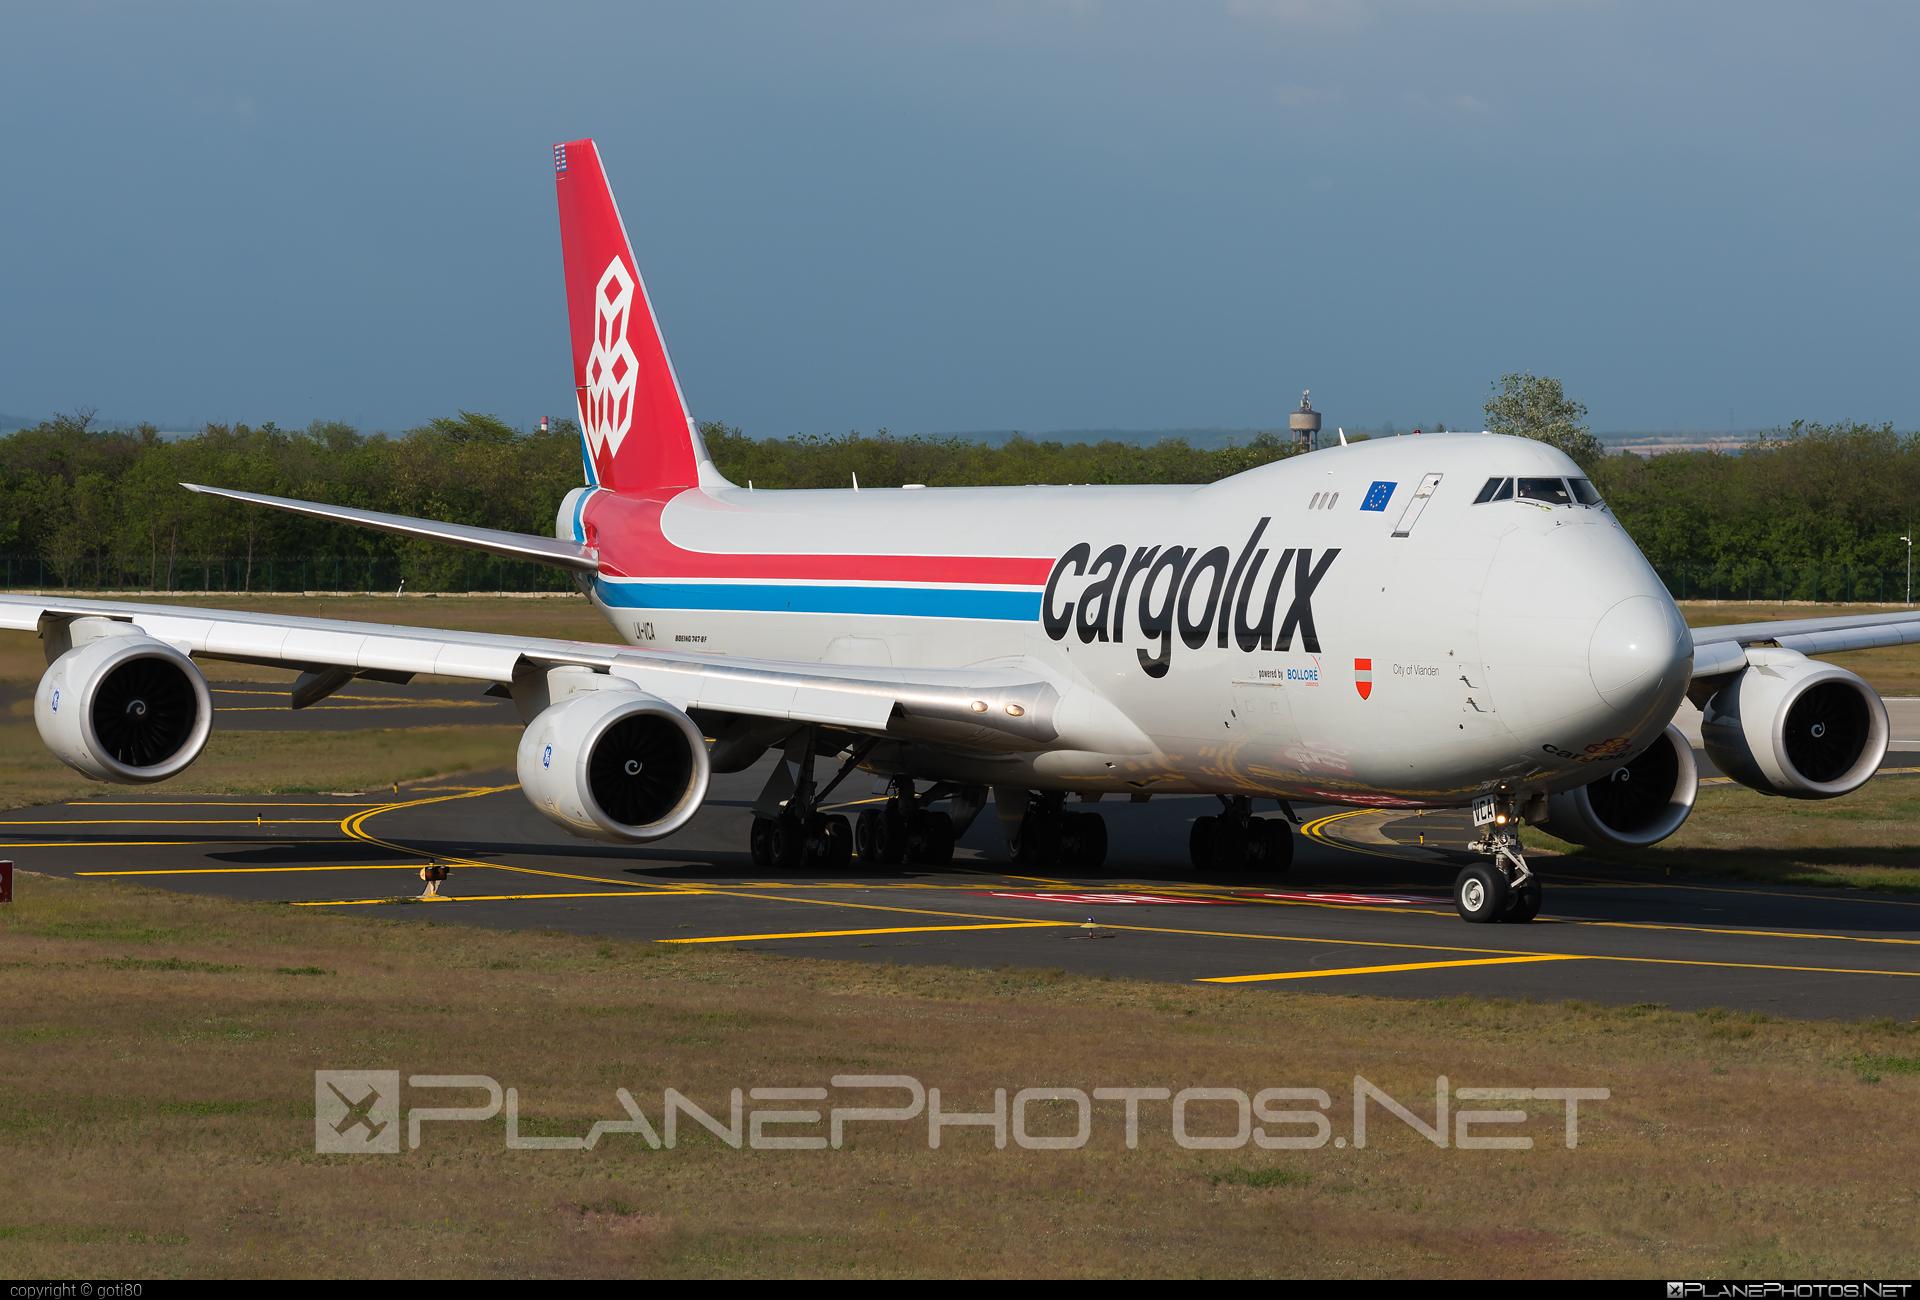 Boeing 747-8F - LX-VCA operated by Cargolux Airlines International #b747 #b747f #b747freighter #boeing #boeing747 #cargolux #jumbo